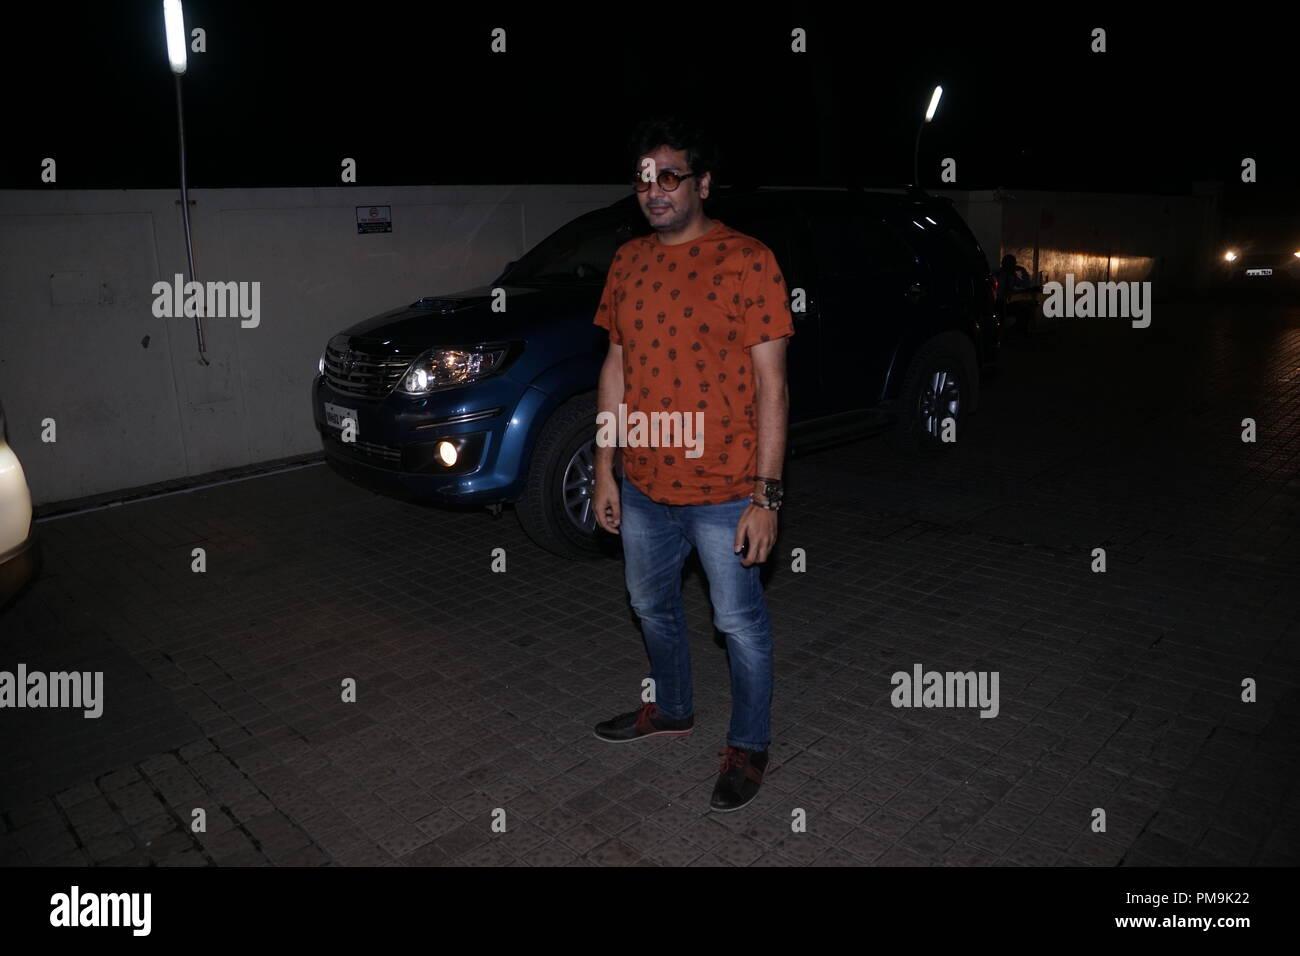 Mumbai, India. 17th Sep 2018. casting director Mukesh Chhabra during Special  screening of movie 'Manto' at PVR juhu in Mumbai on 17th sep 2018. Photo by Prordip Guha Credit: Prodip Guha/Alamy Live News - Stock Image